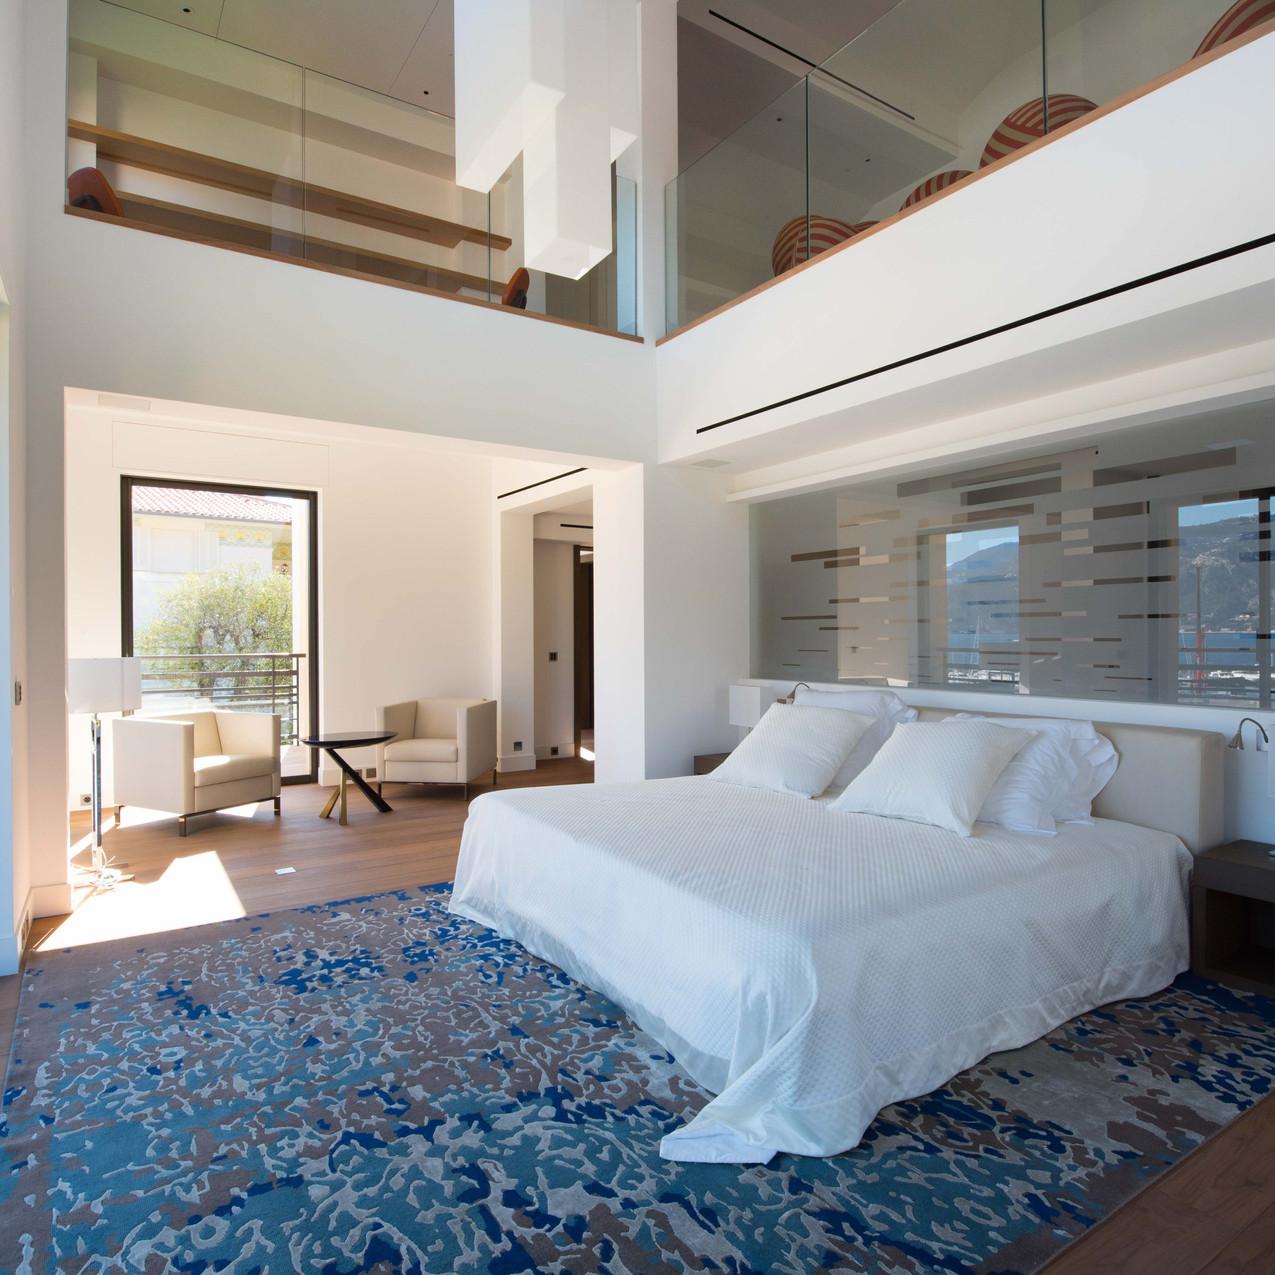 photographe architecture nice france french riviera paca cote dazur interieur-3